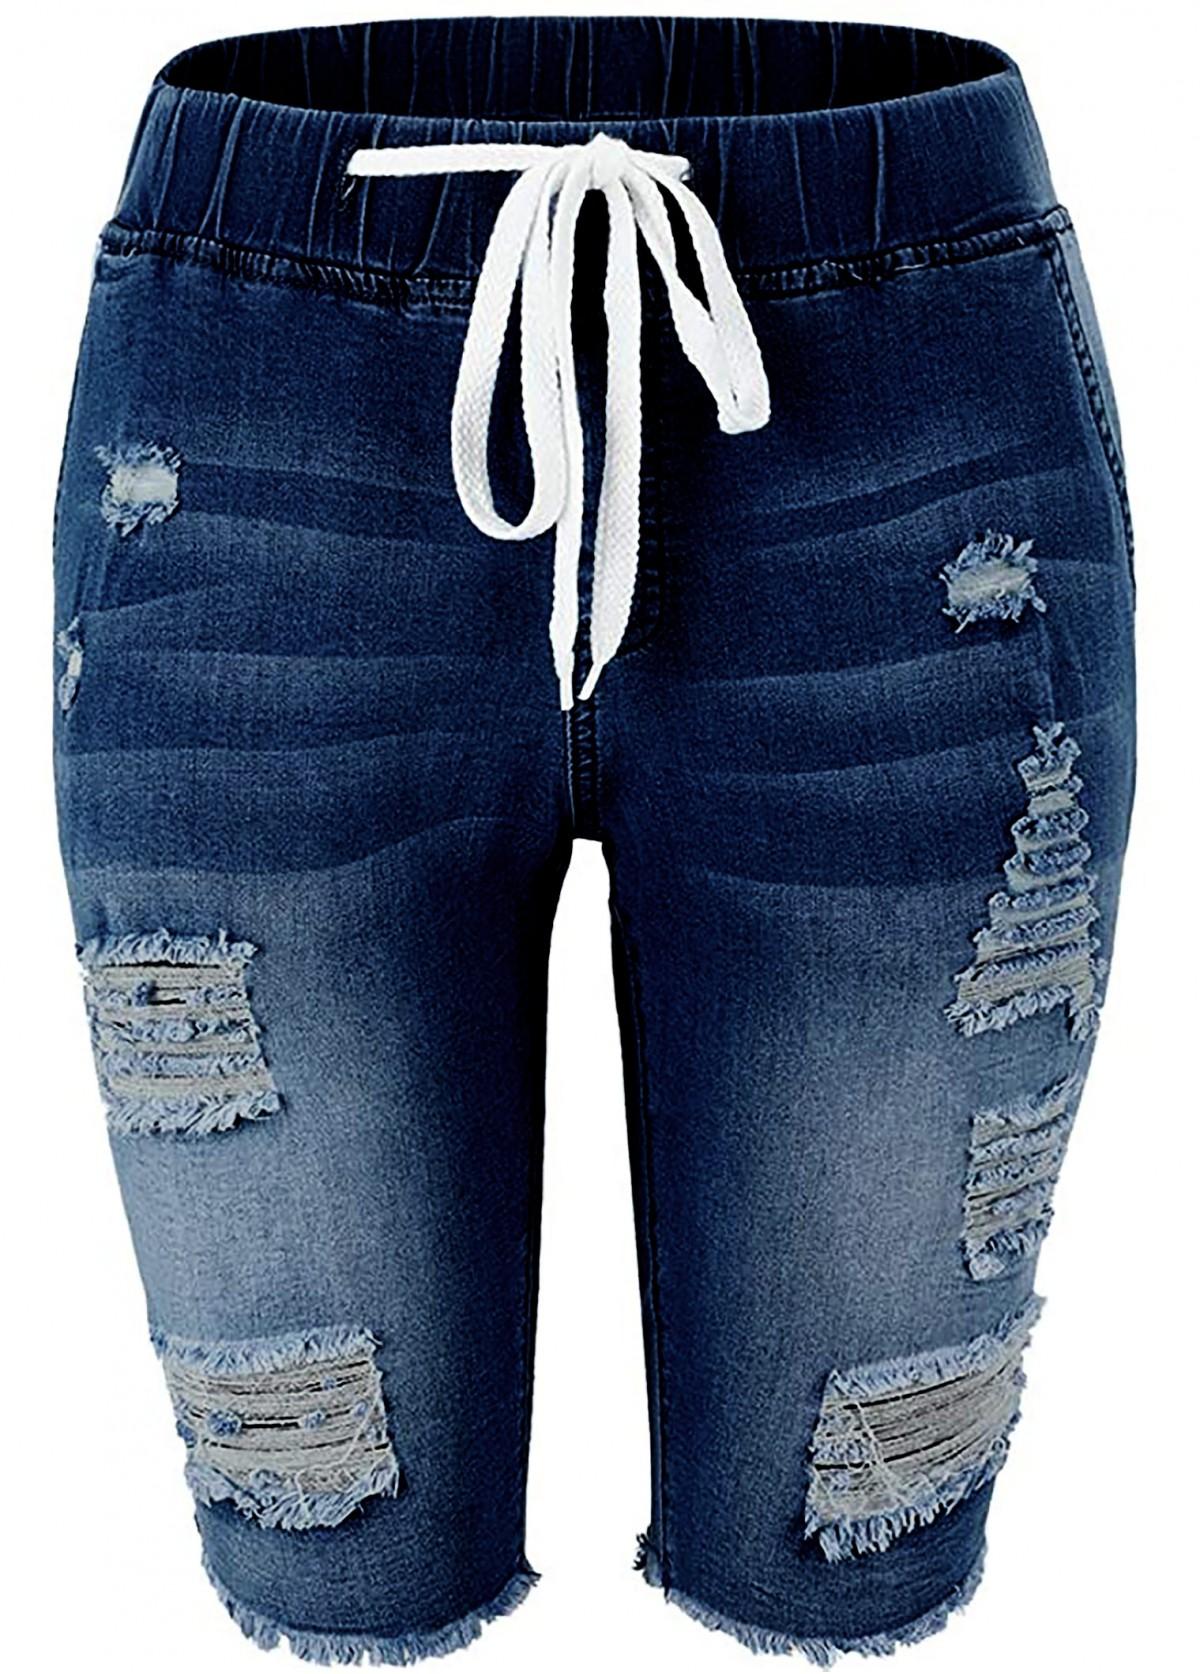 ROTITA Drawstring Waist Shredded Denim Blue Shorts